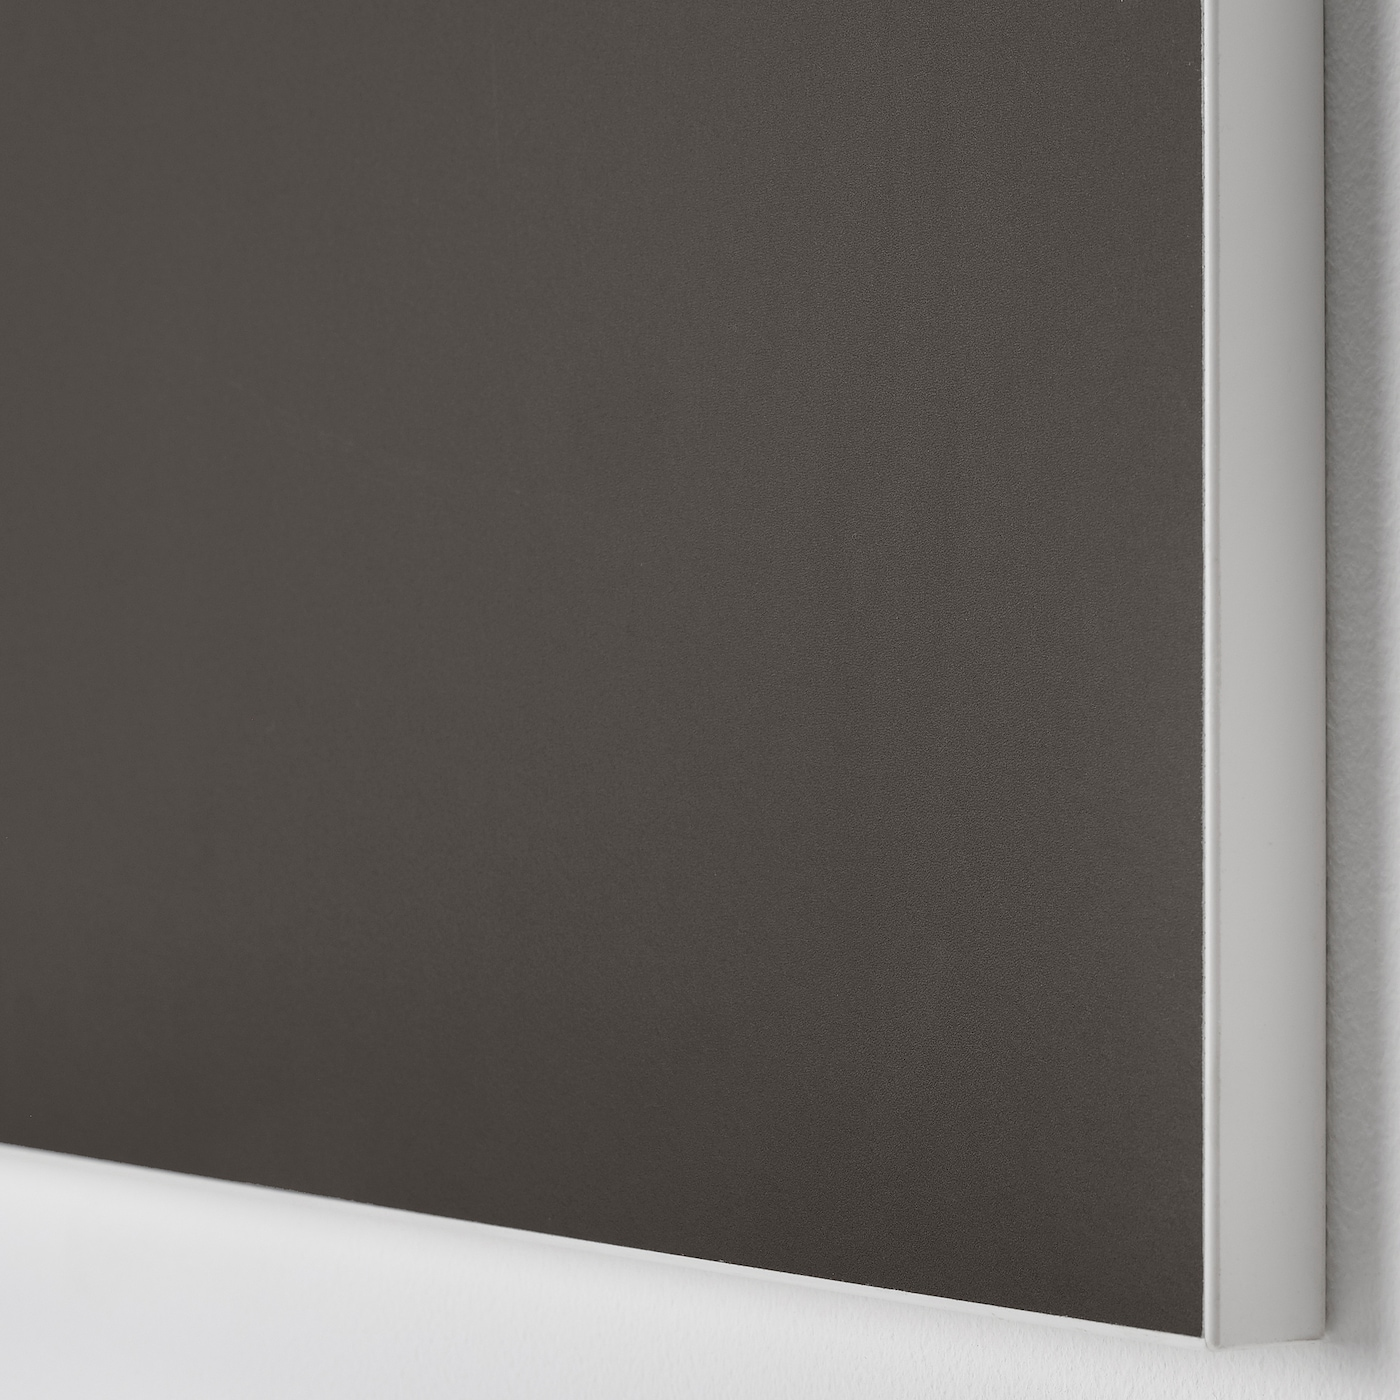 SKATVAL Pair of sliding doors, dark grey, 120x180 cm